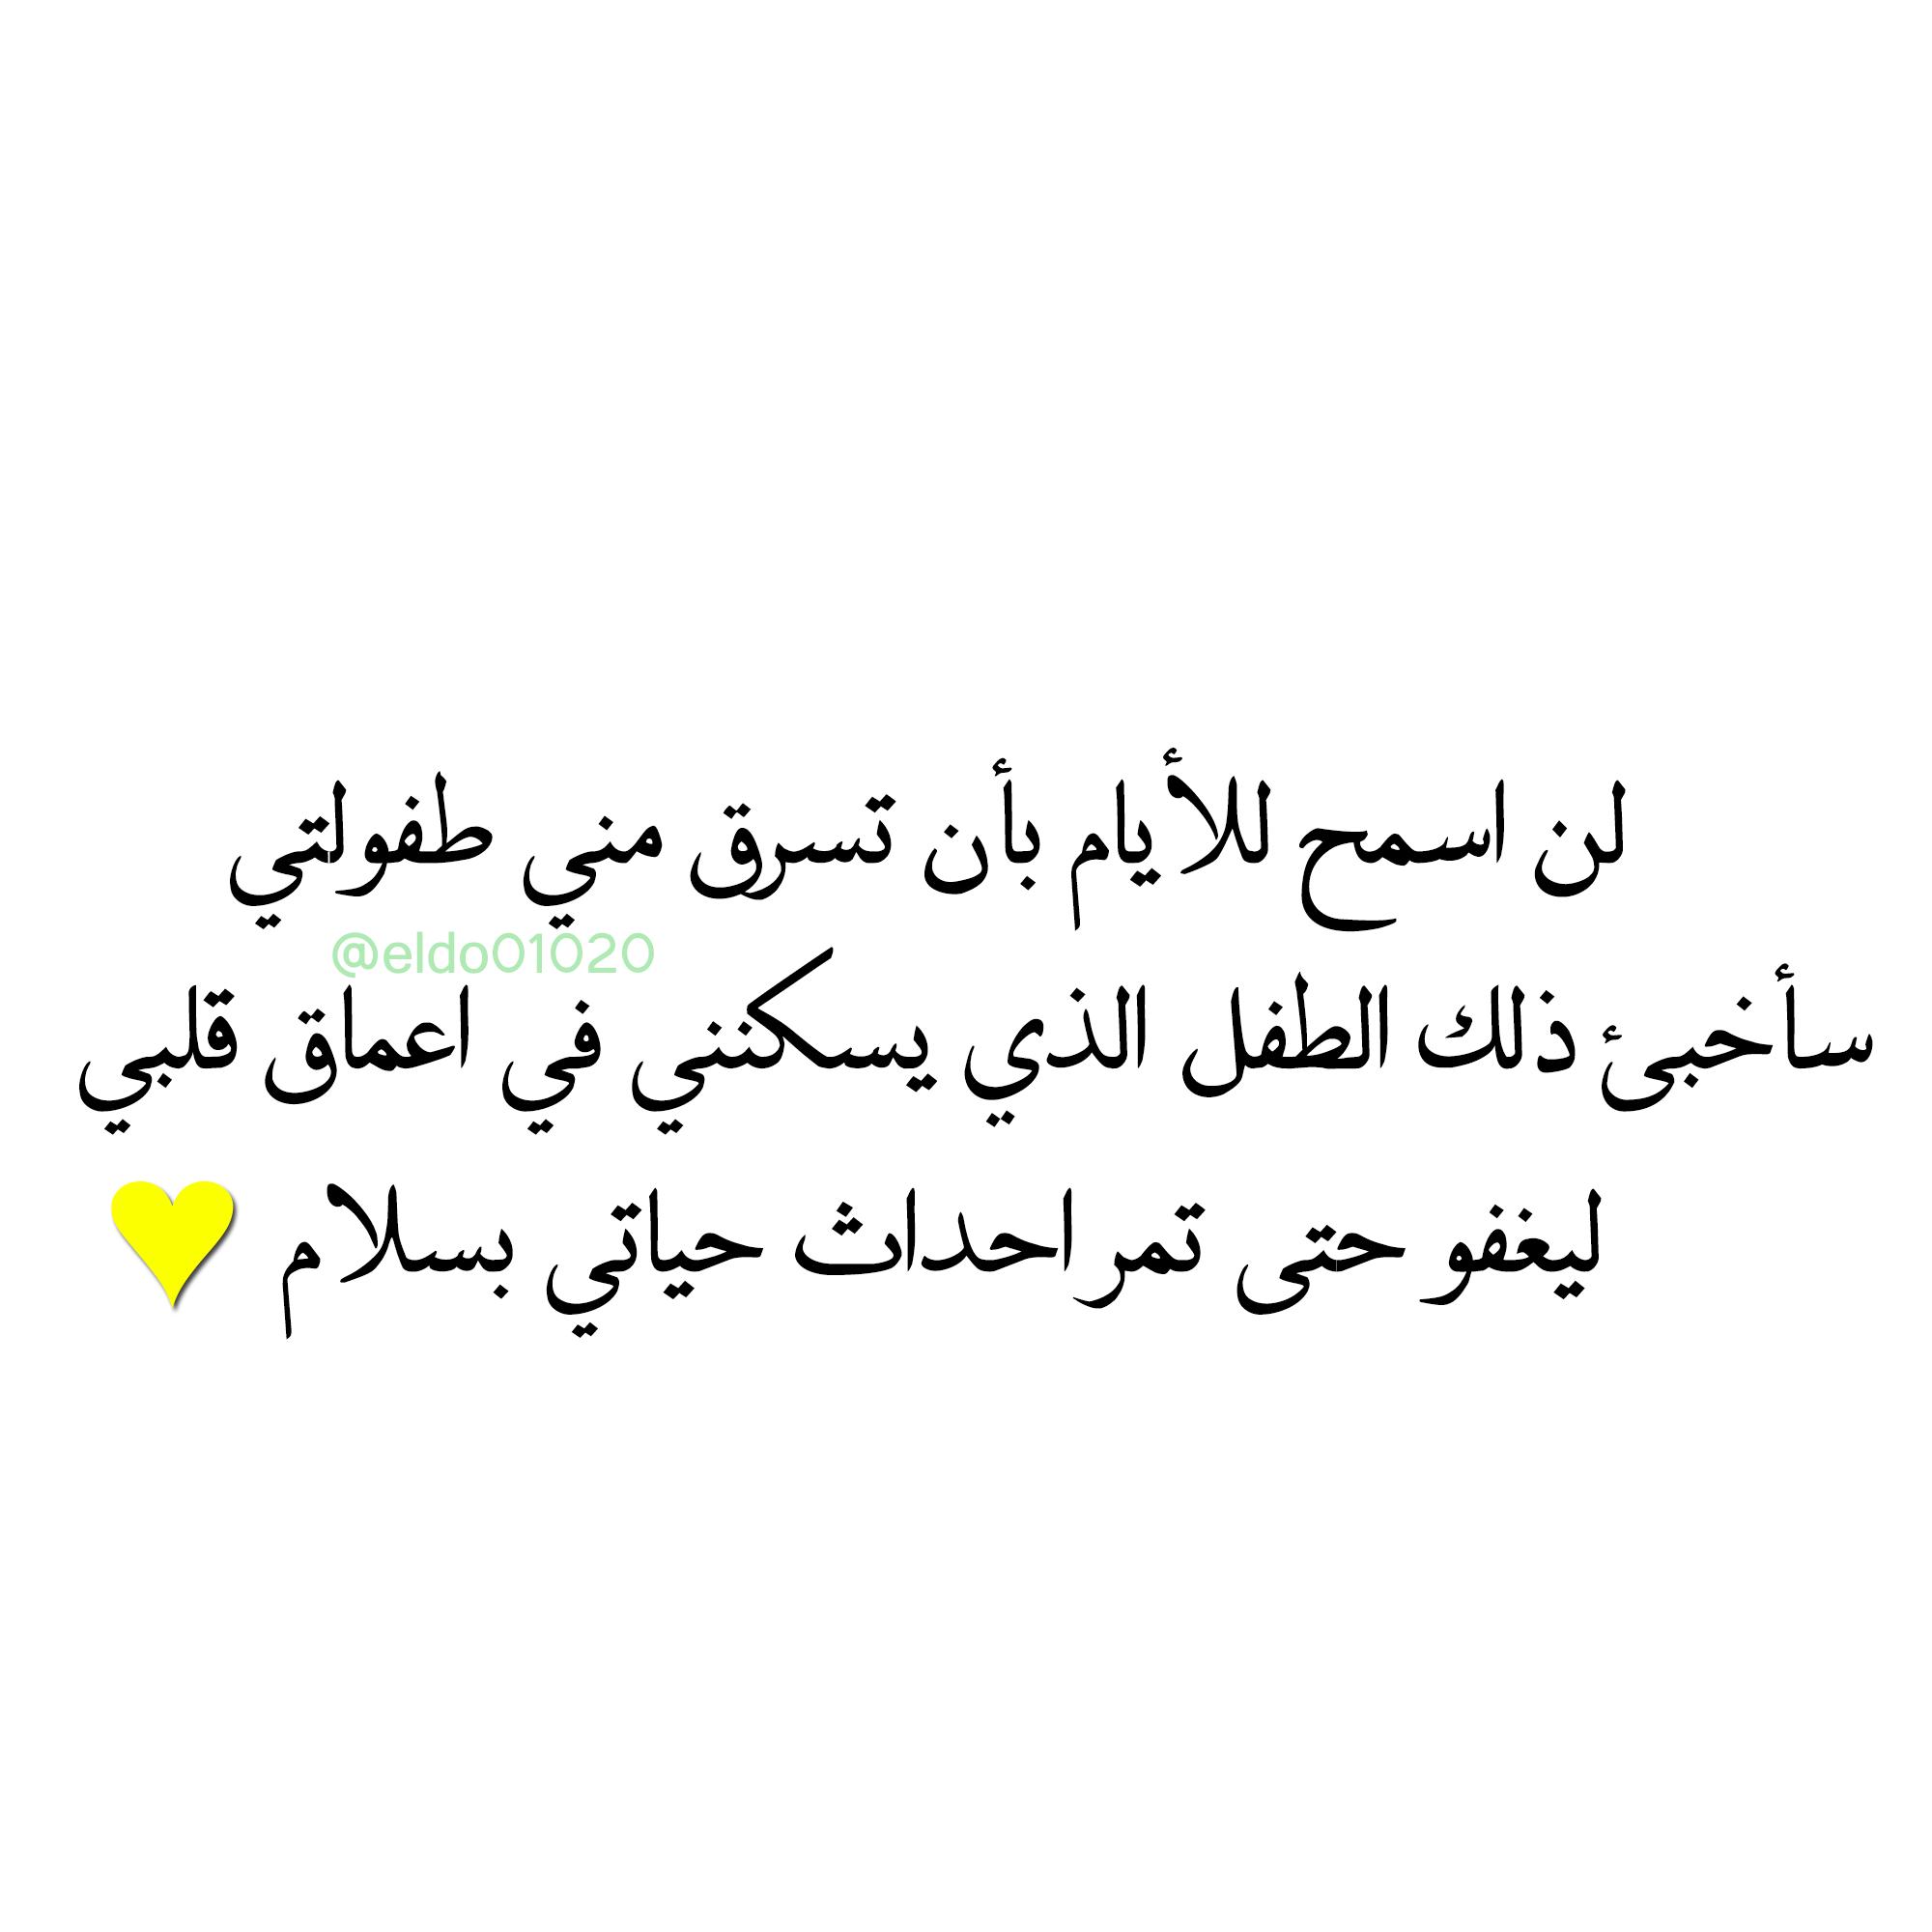 عربي كلمات مقتبسات مصري معبرة راقت لي Arabic Calligraphy Ord Calligraphy